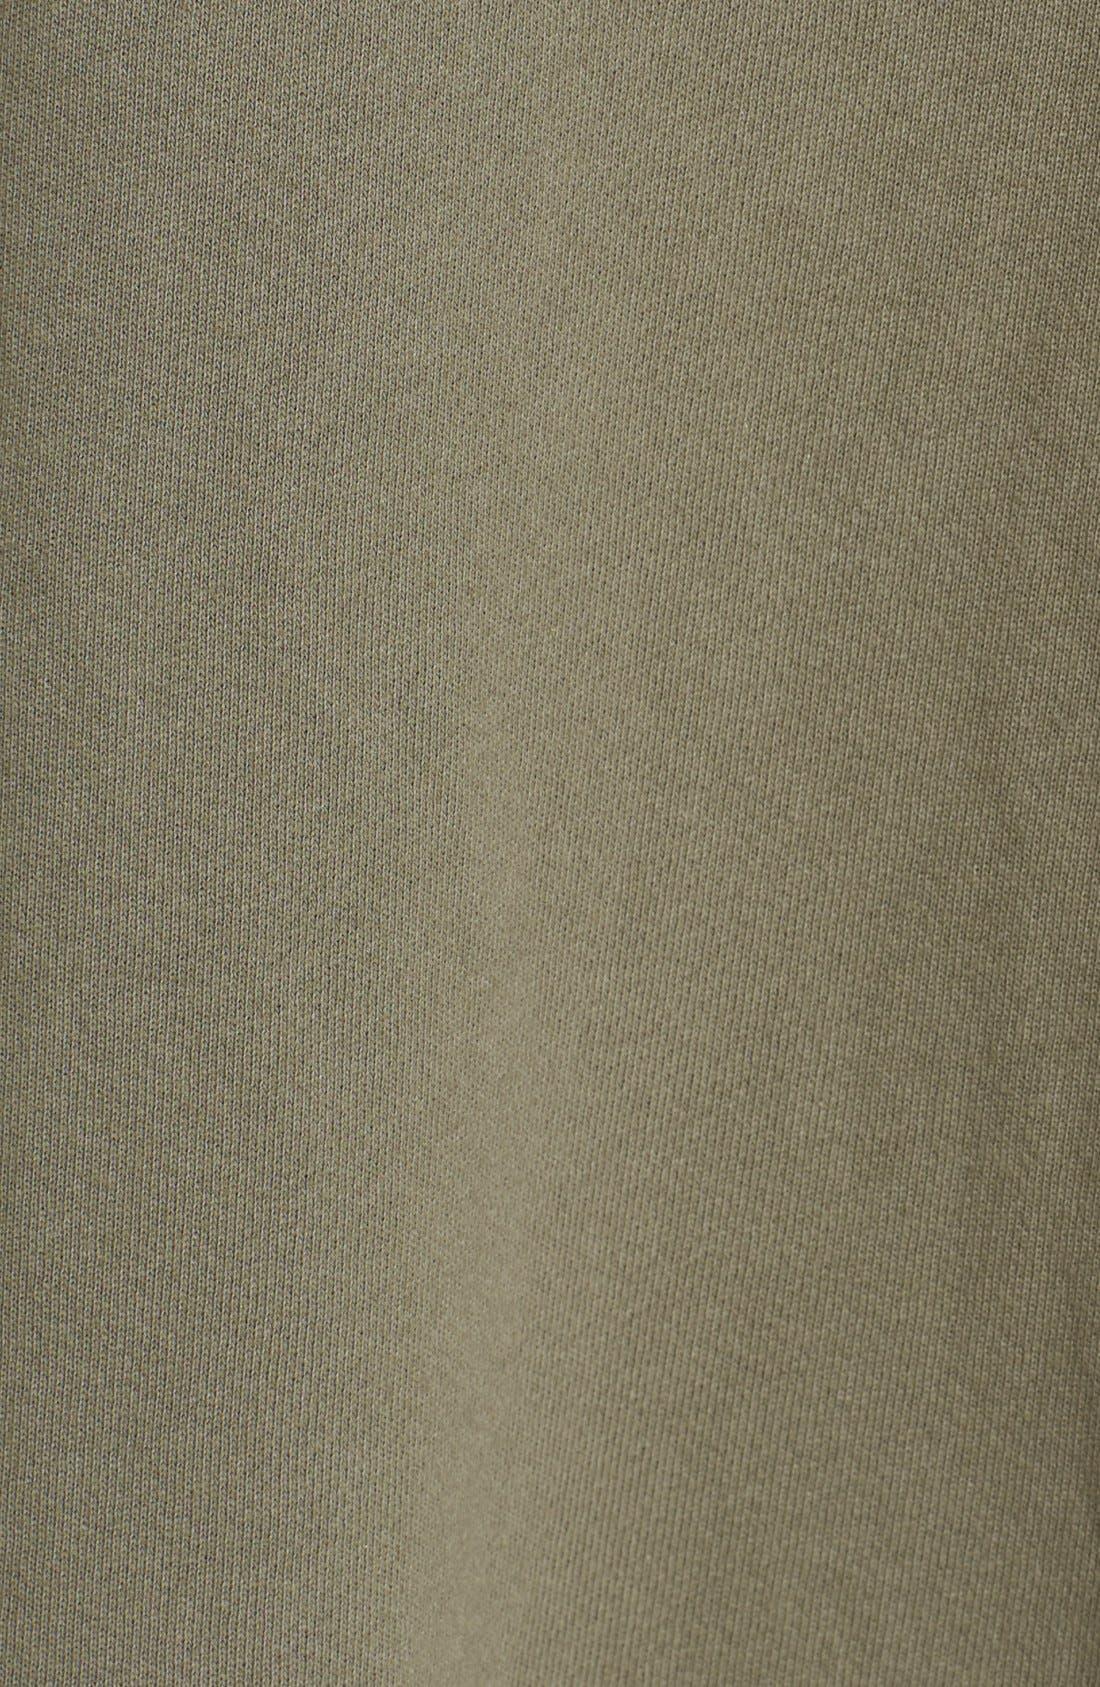 Alternate Image 5  - Soft Joie 'Kory' Boxy Hooded Pullover